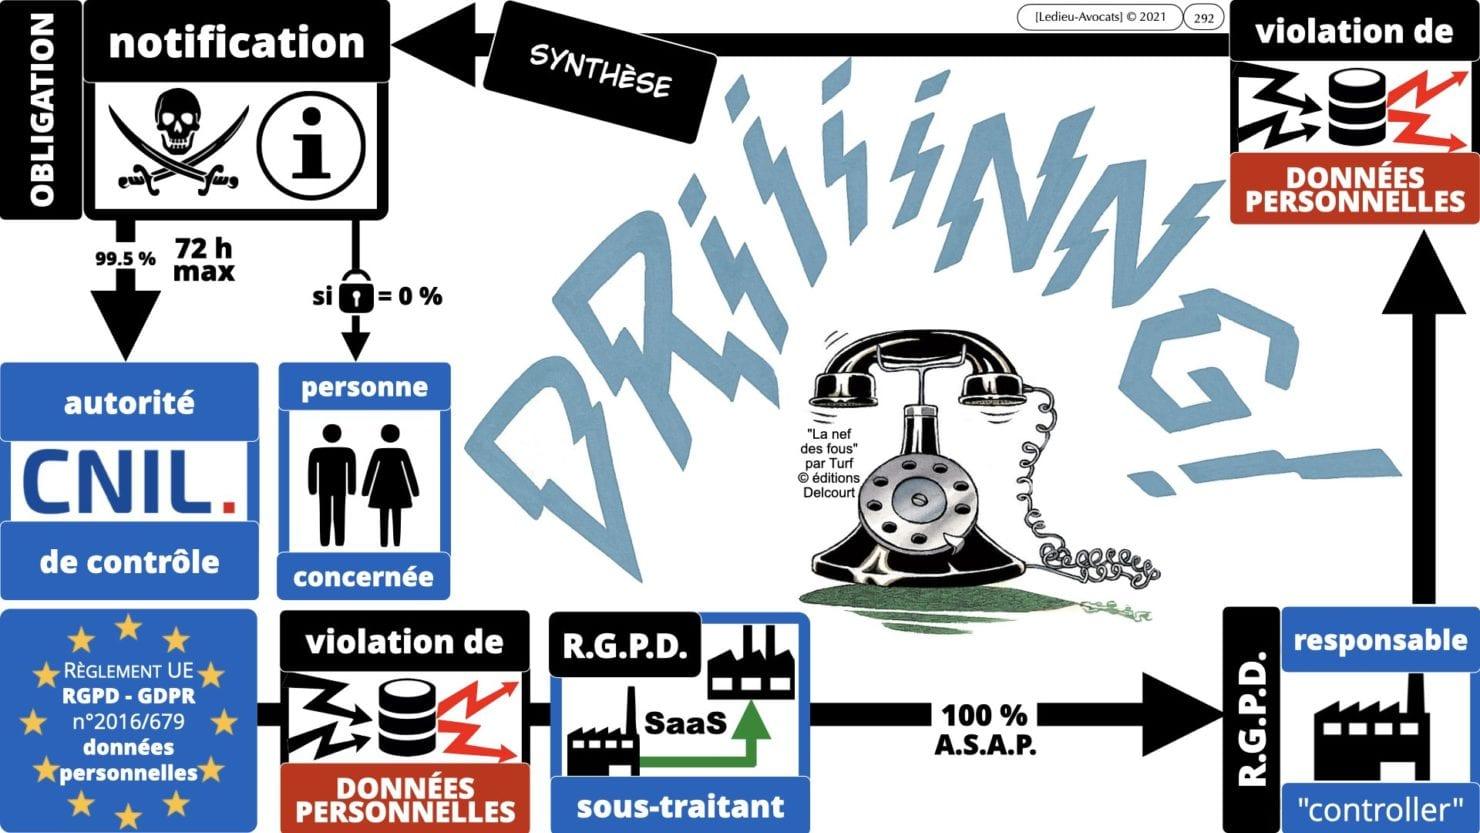 RGPD e-Privacy principes actualité jurisprudence ©Ledieu-Avocats 25-06-2021.292